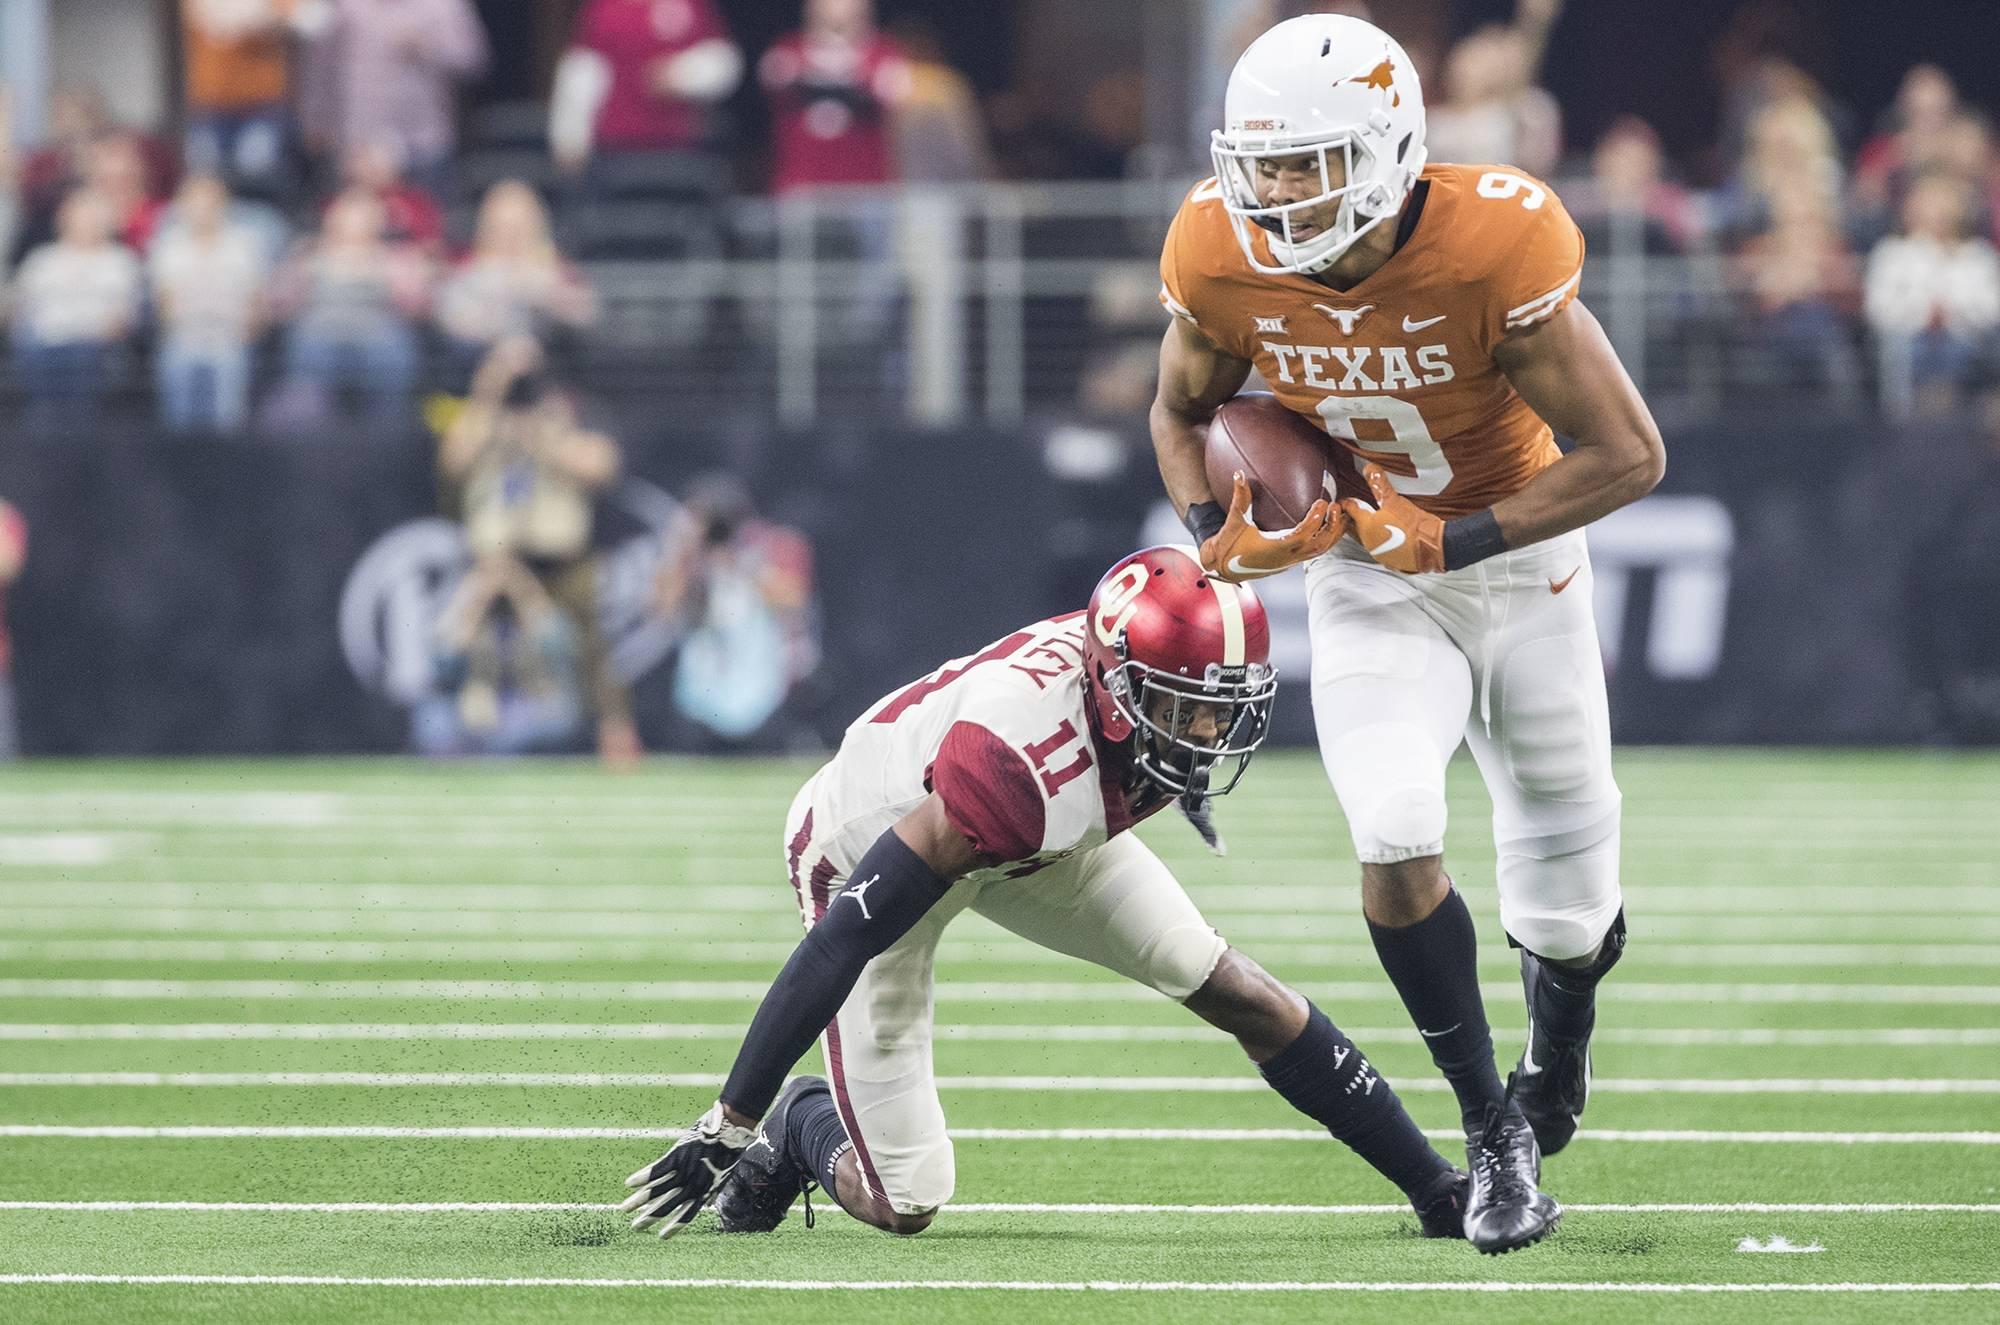 Texas will send six players to Big 12 media days next week at AT&T Stadium